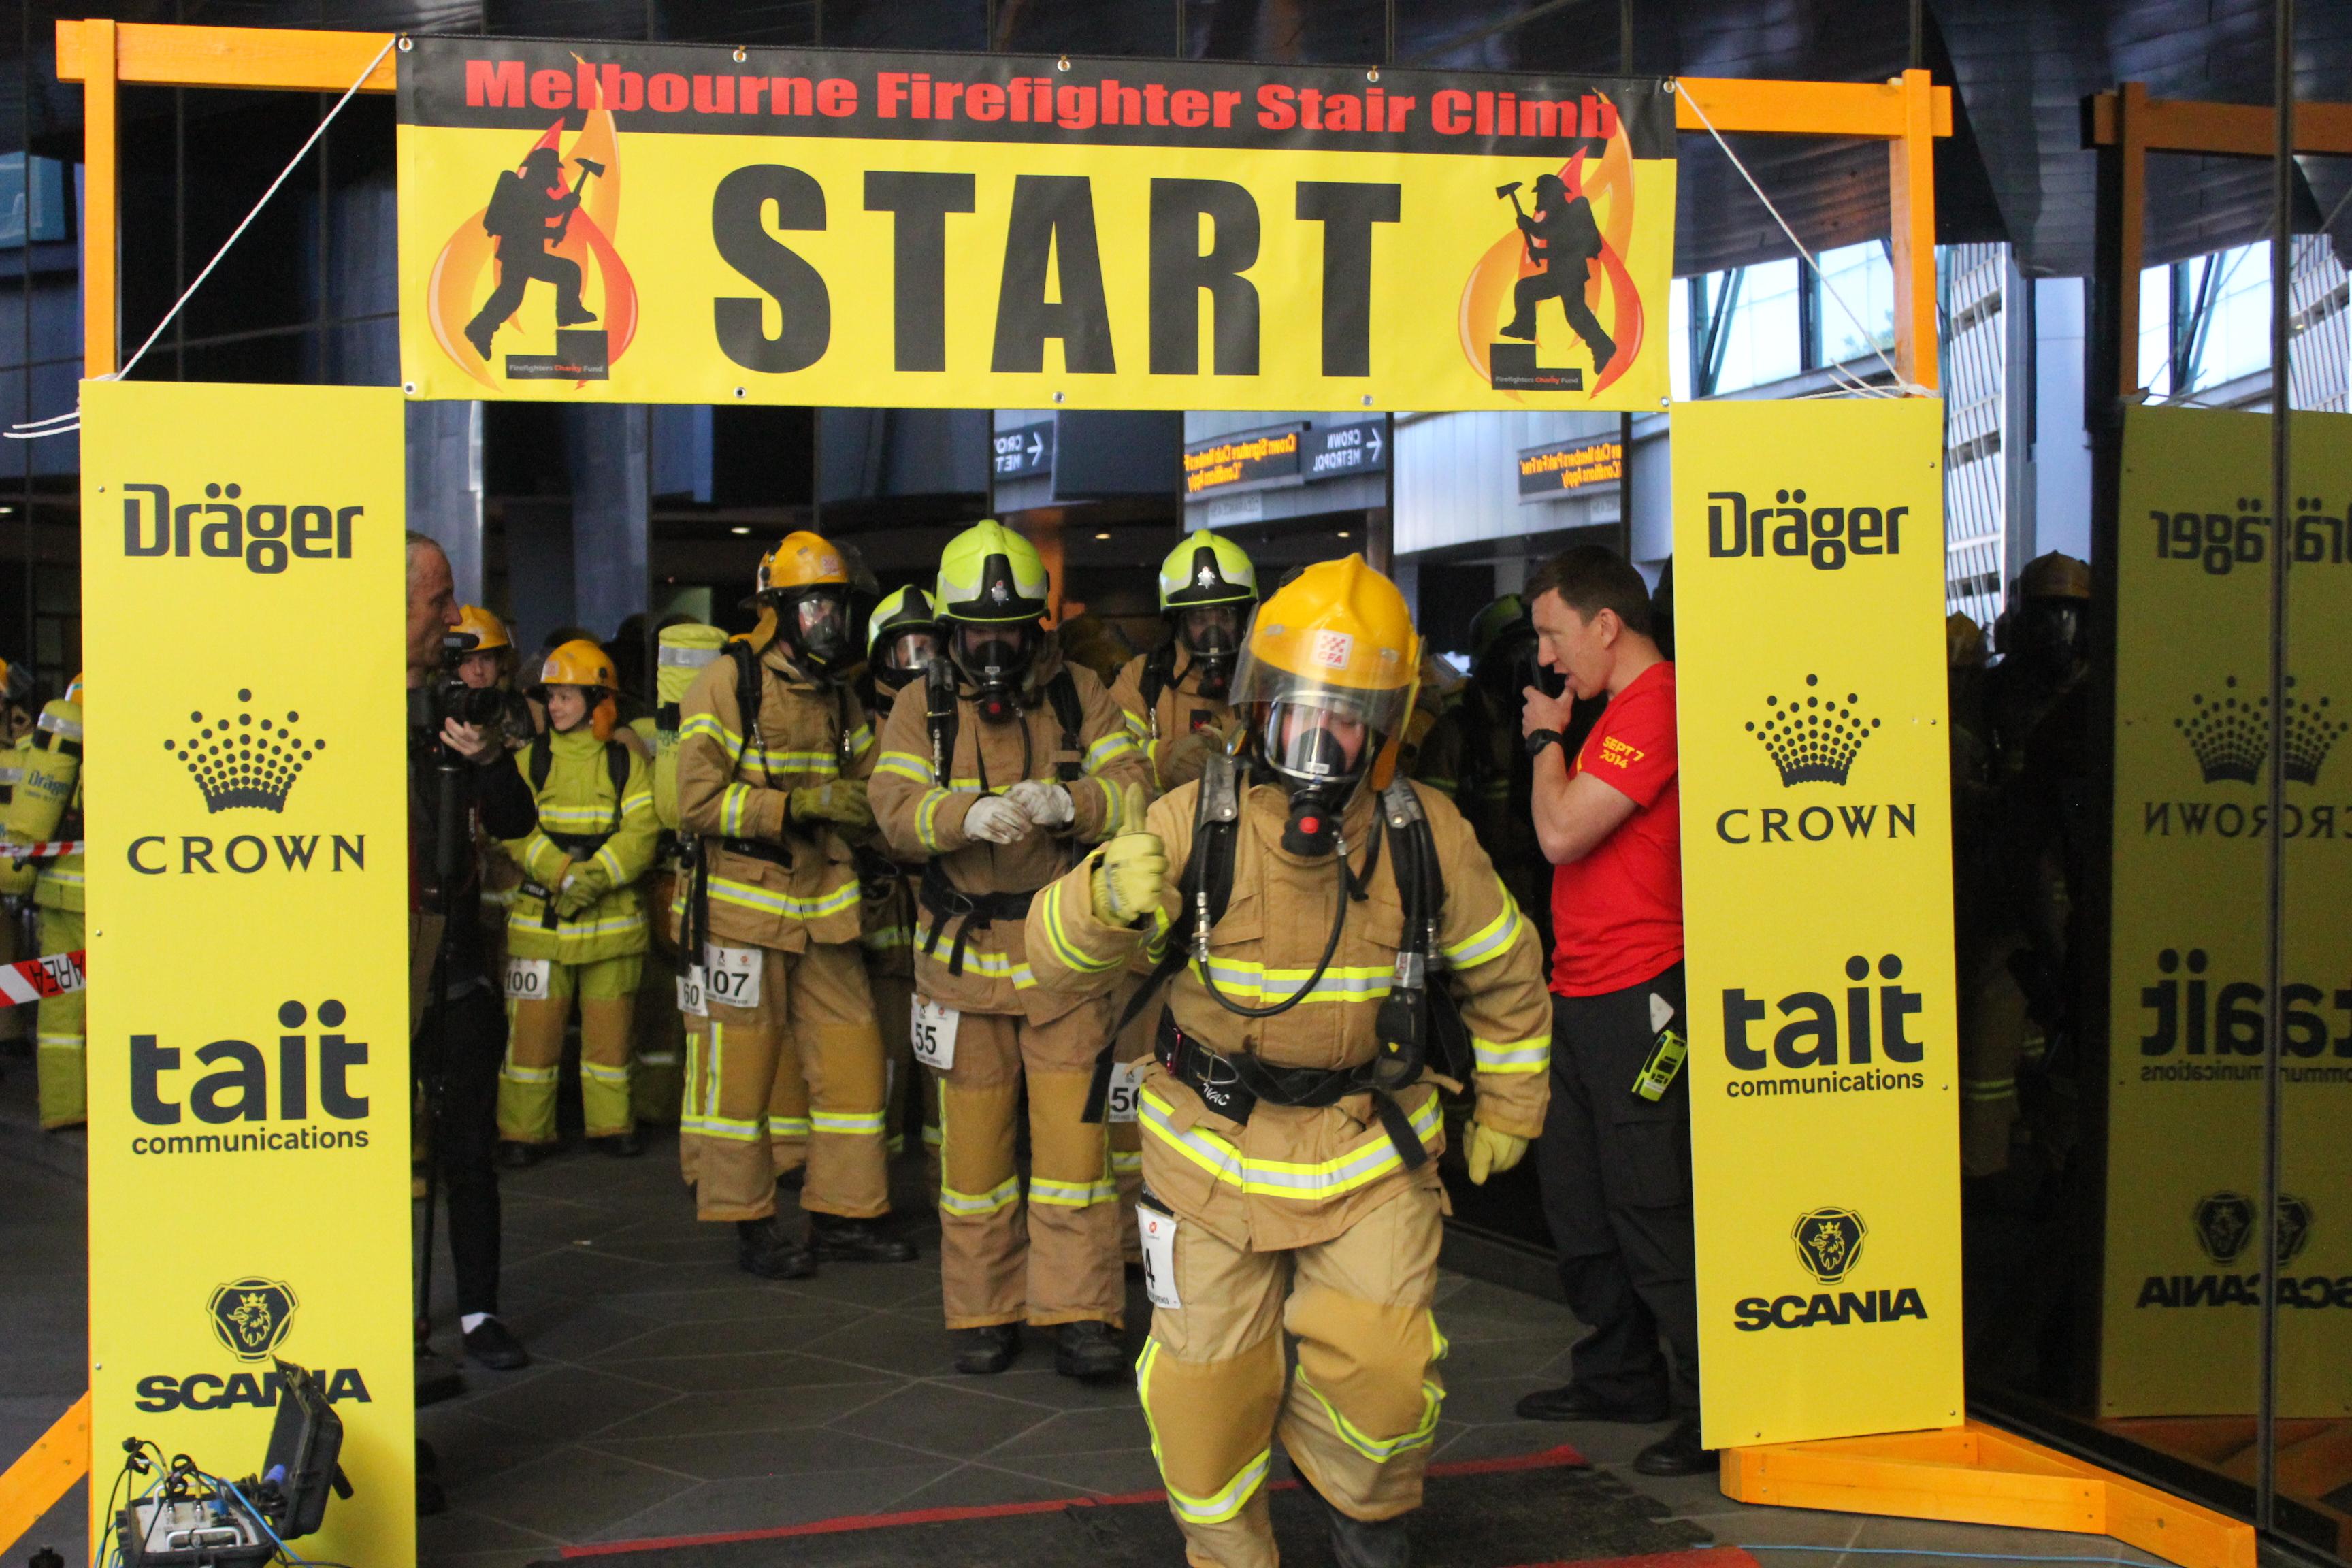 Simon Jakovac Melbourne Firefighter Stair Climb